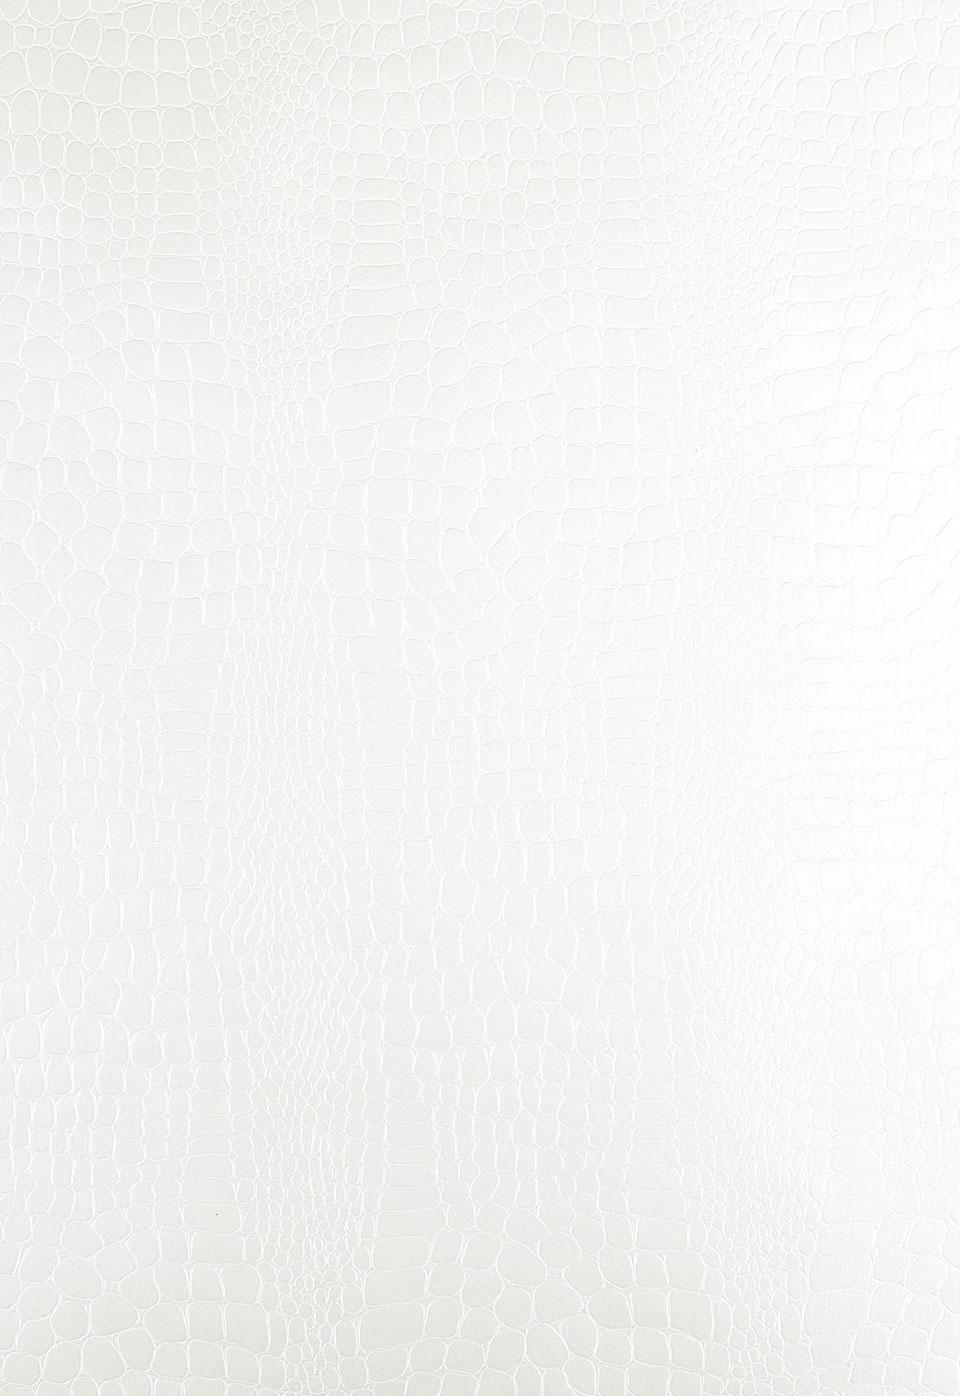 Американские обои Schumacher,  коллекция Modern Glamour, артикул5005830